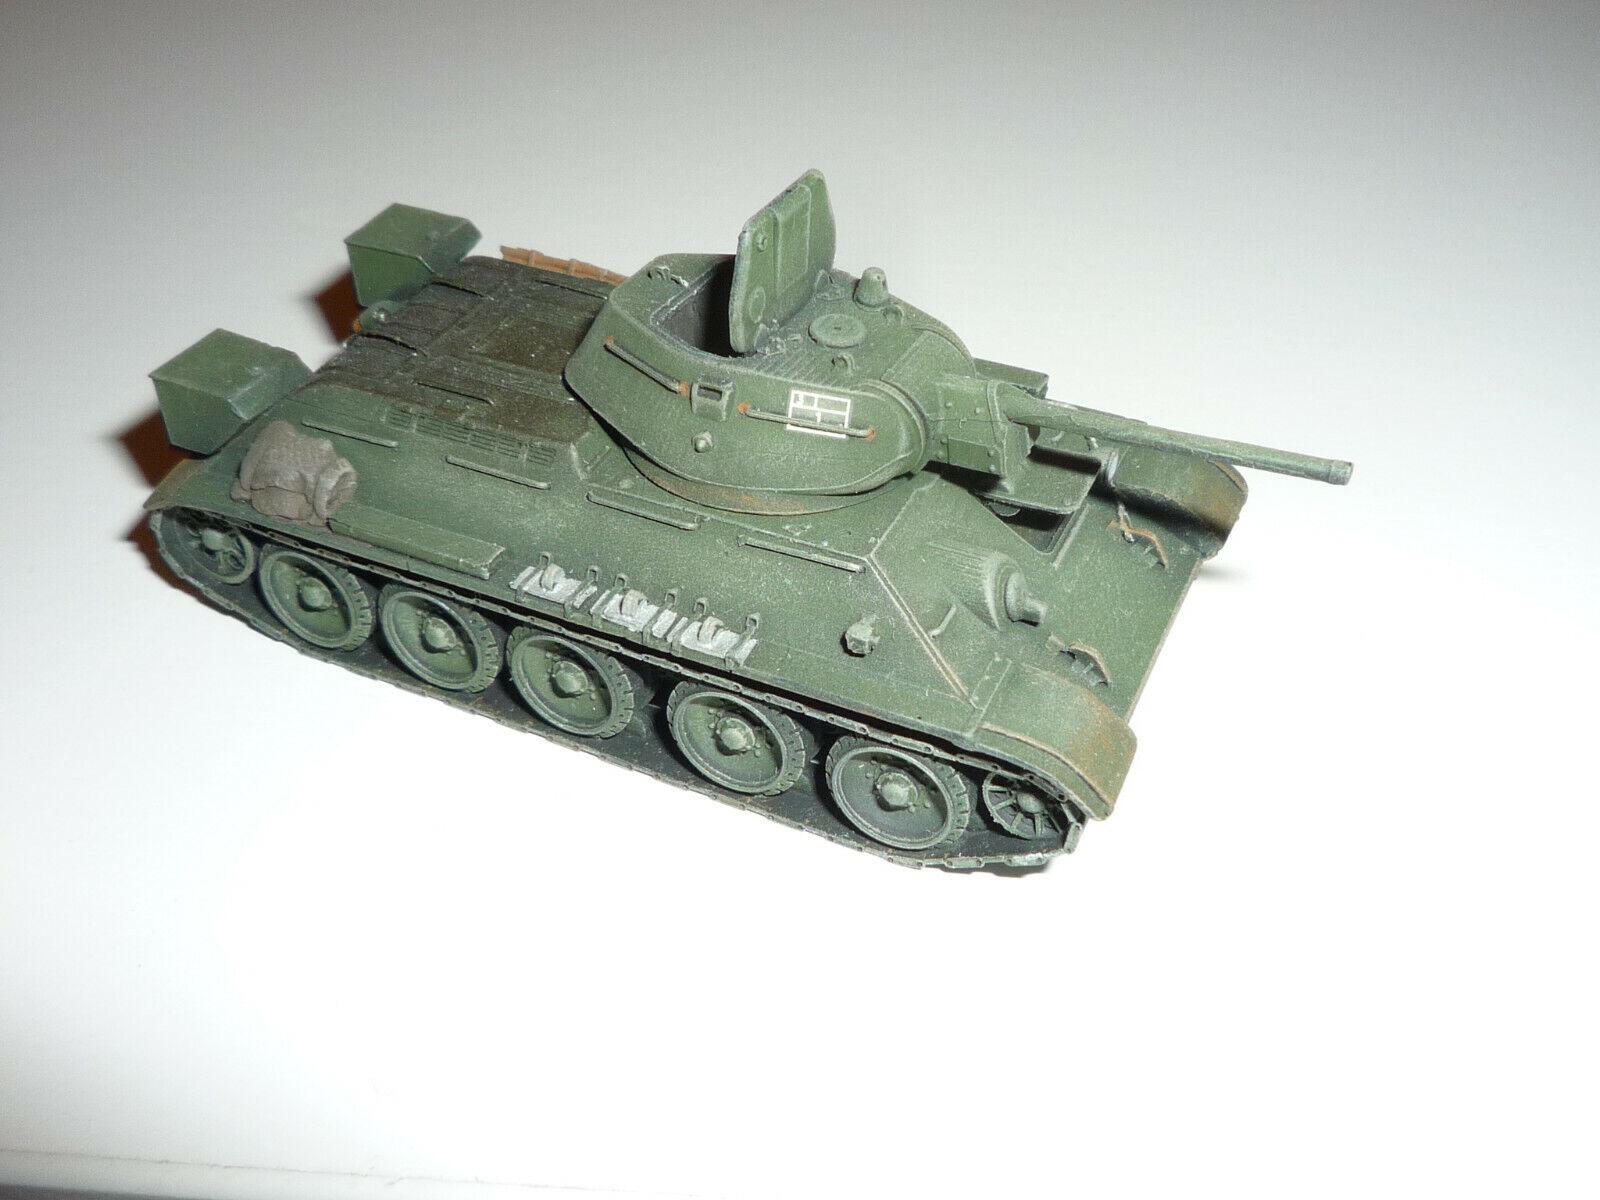 Artitec 1 87 - 6870021 Kampfpanzer T34-76 Soviet Army Green   rede Armee - X448X